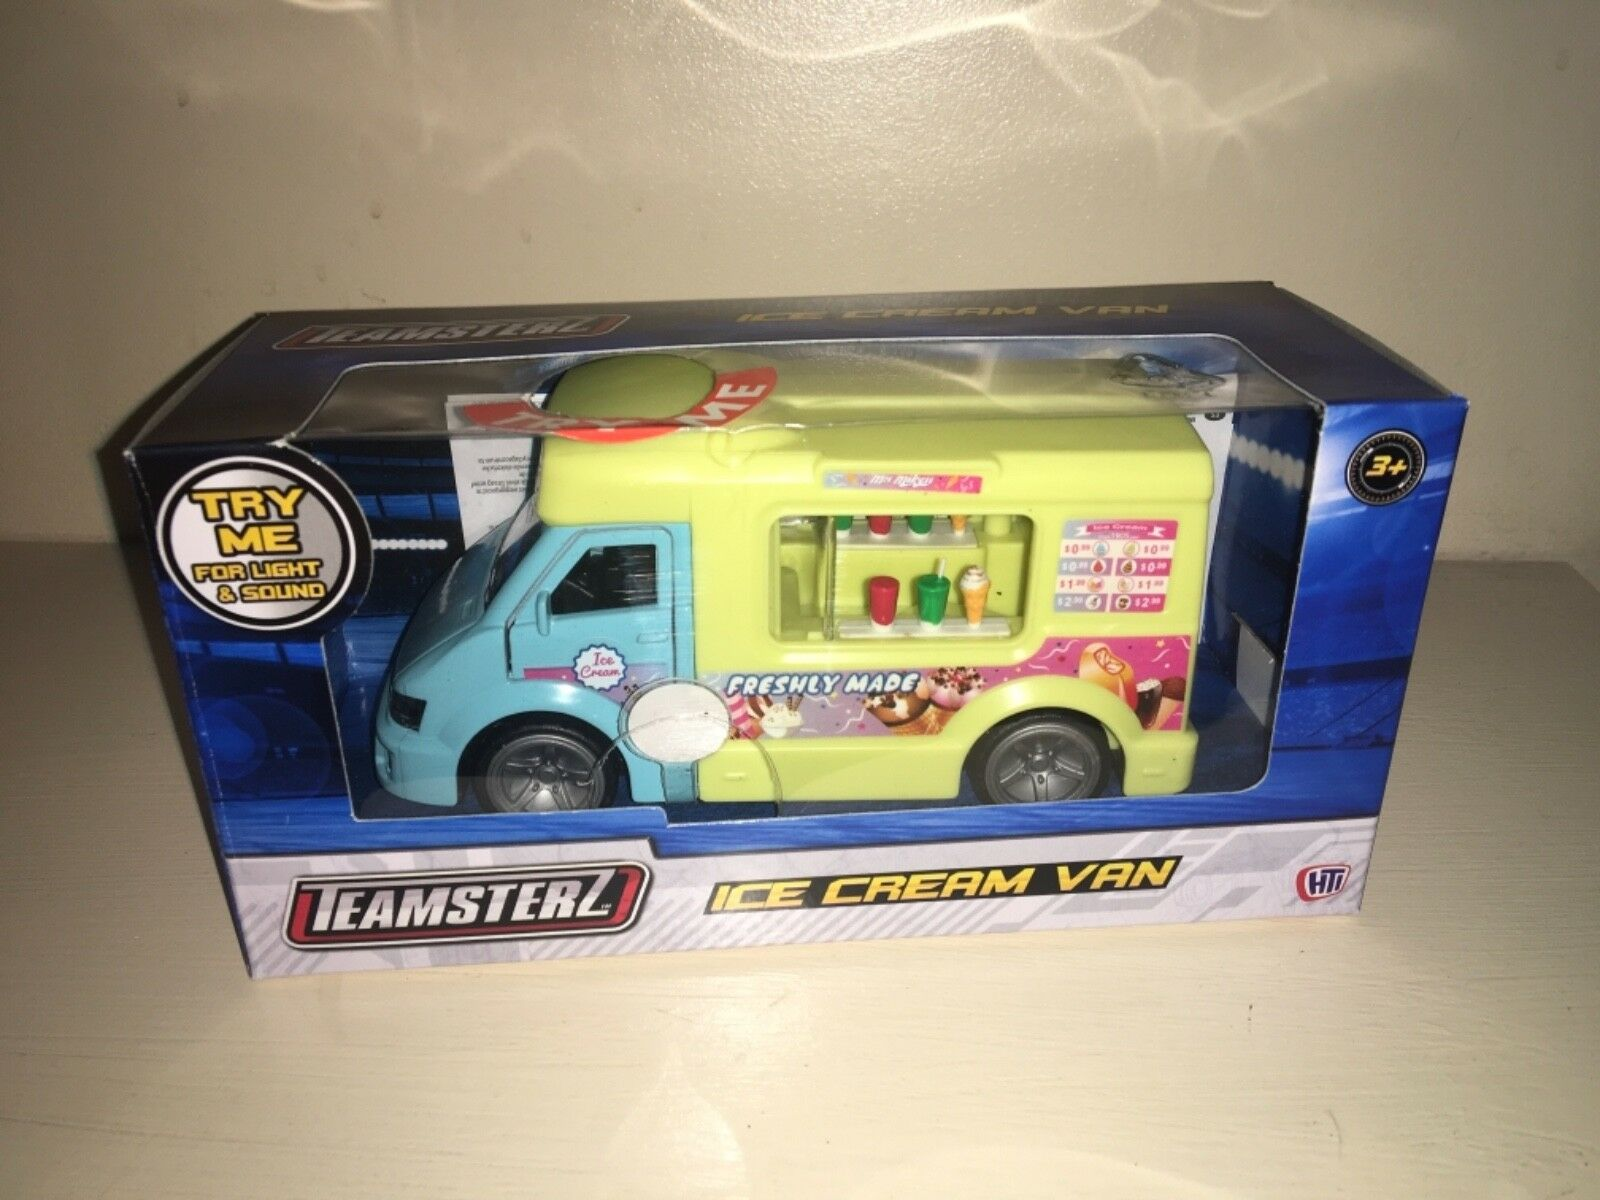 Teamsterz Musical Ice Cream Van Lights & Sounds Die cast Toy Model Vehicle Kids